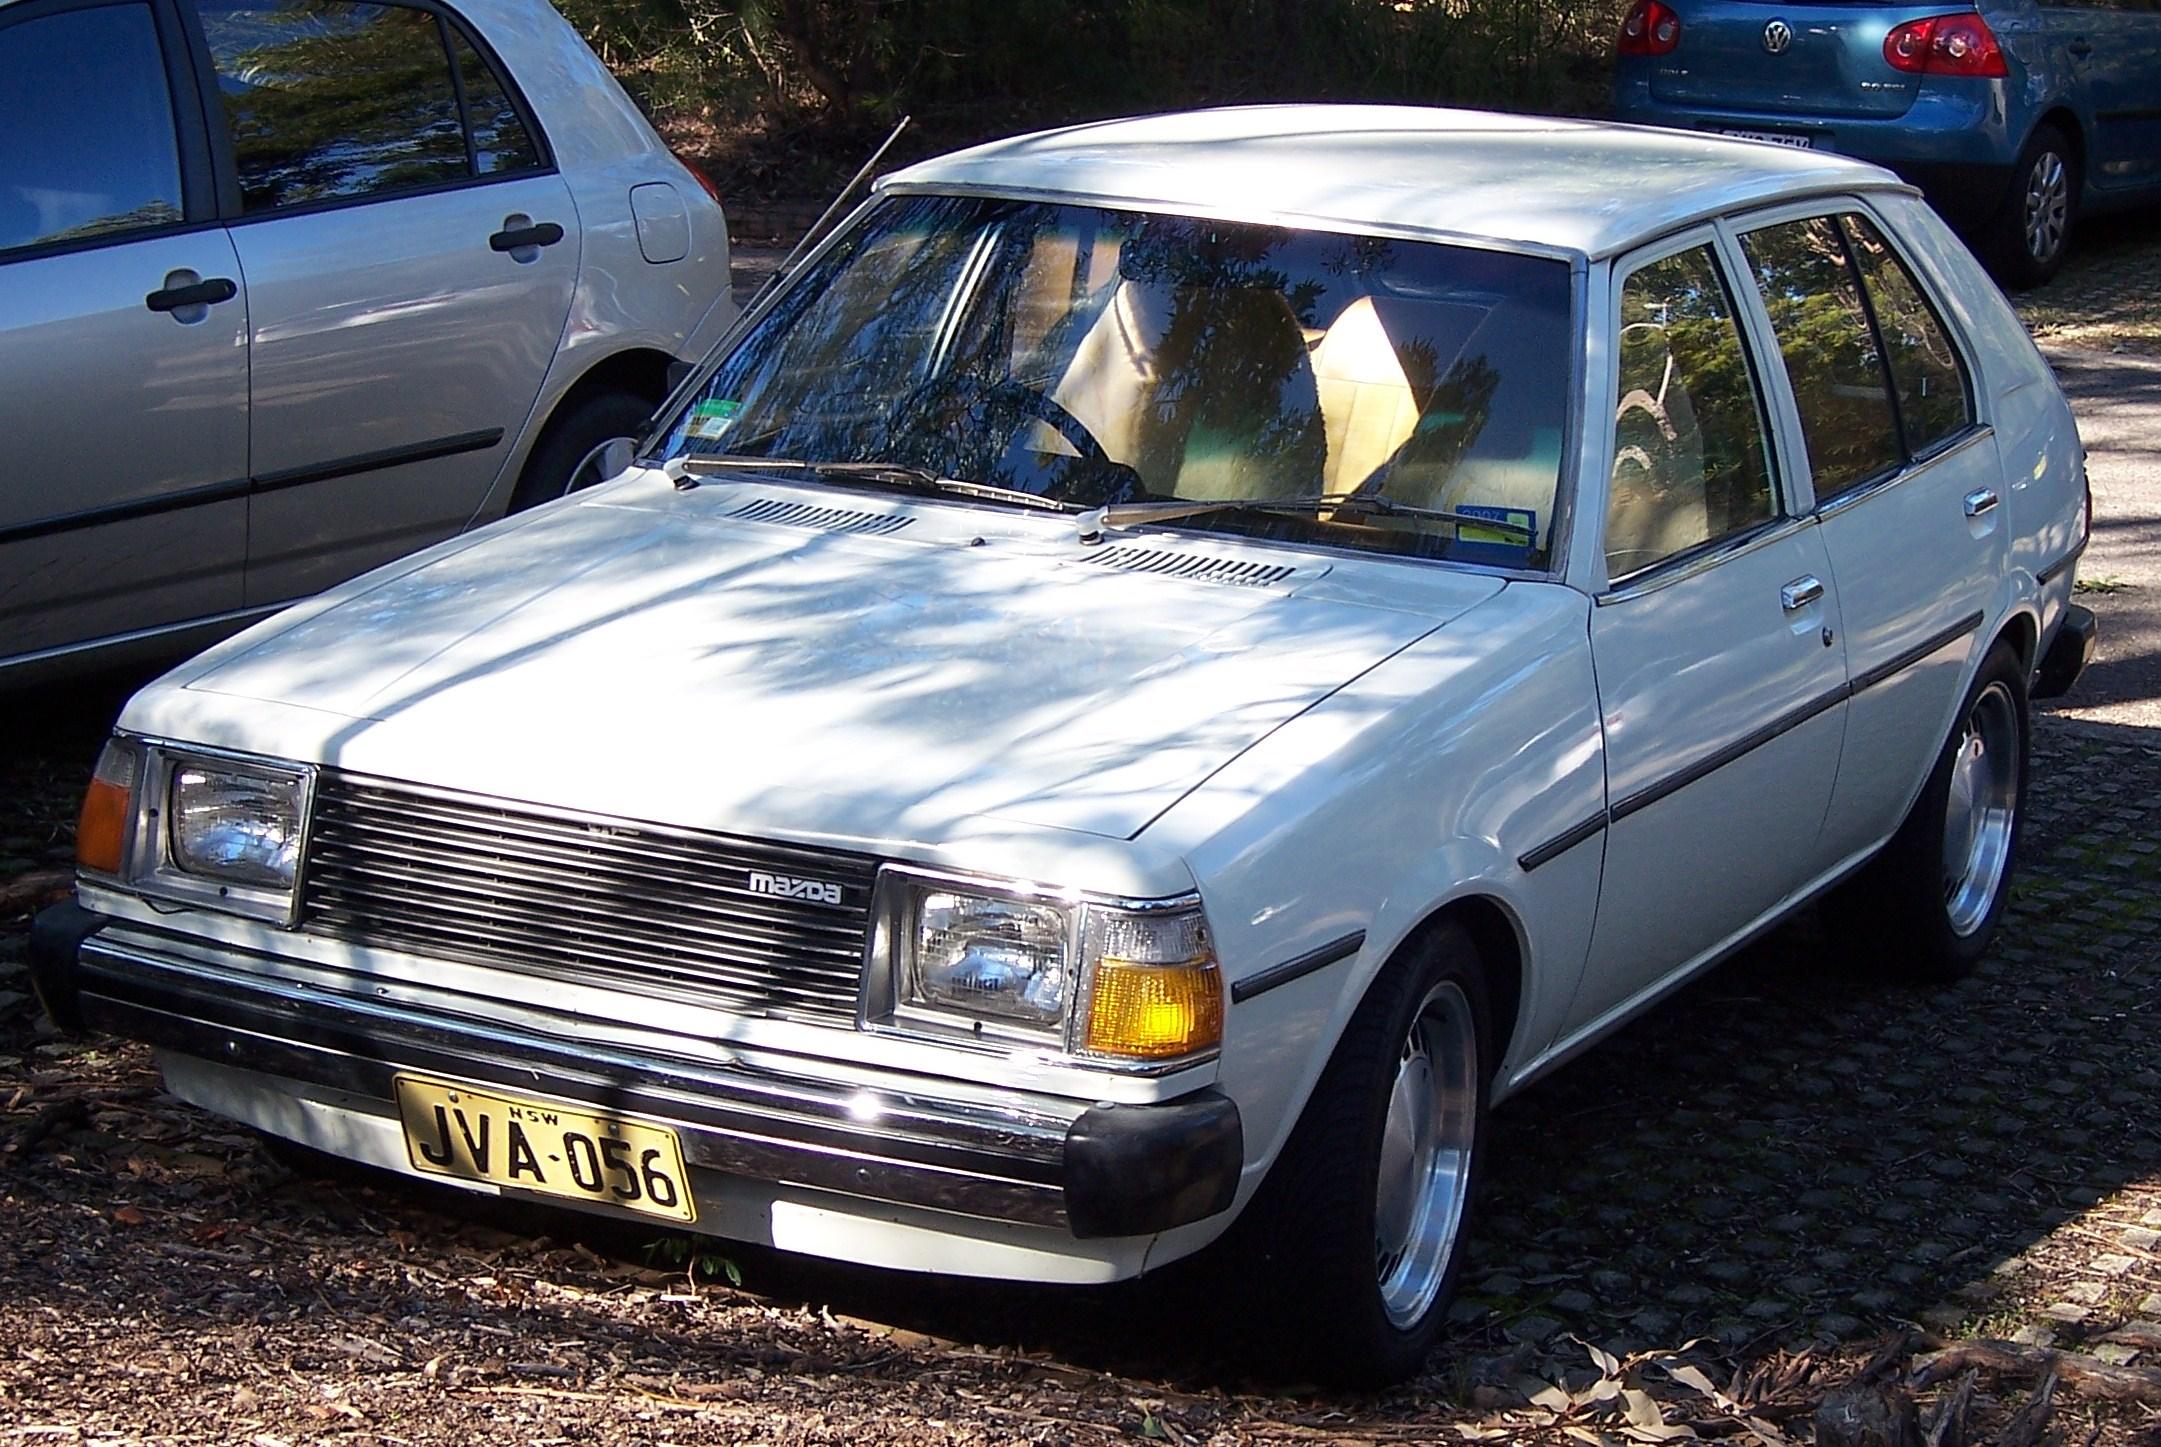 file:1979-1980 mazda 323 1.4 hatchback 01 - wikimedia commons